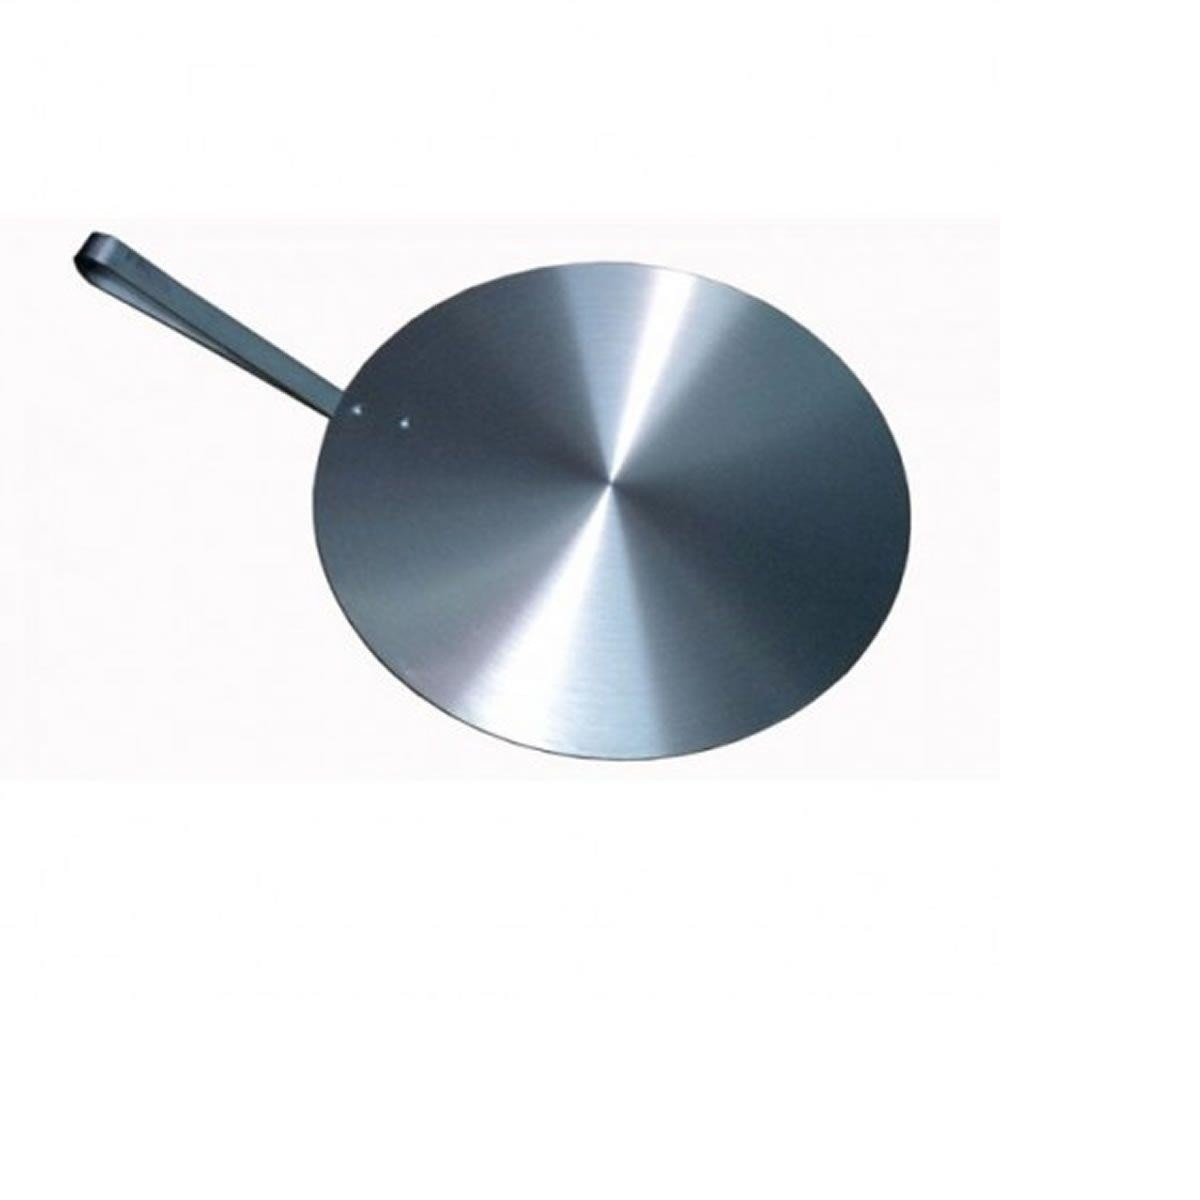 Pá para Pizza de Alumínio 30 cm